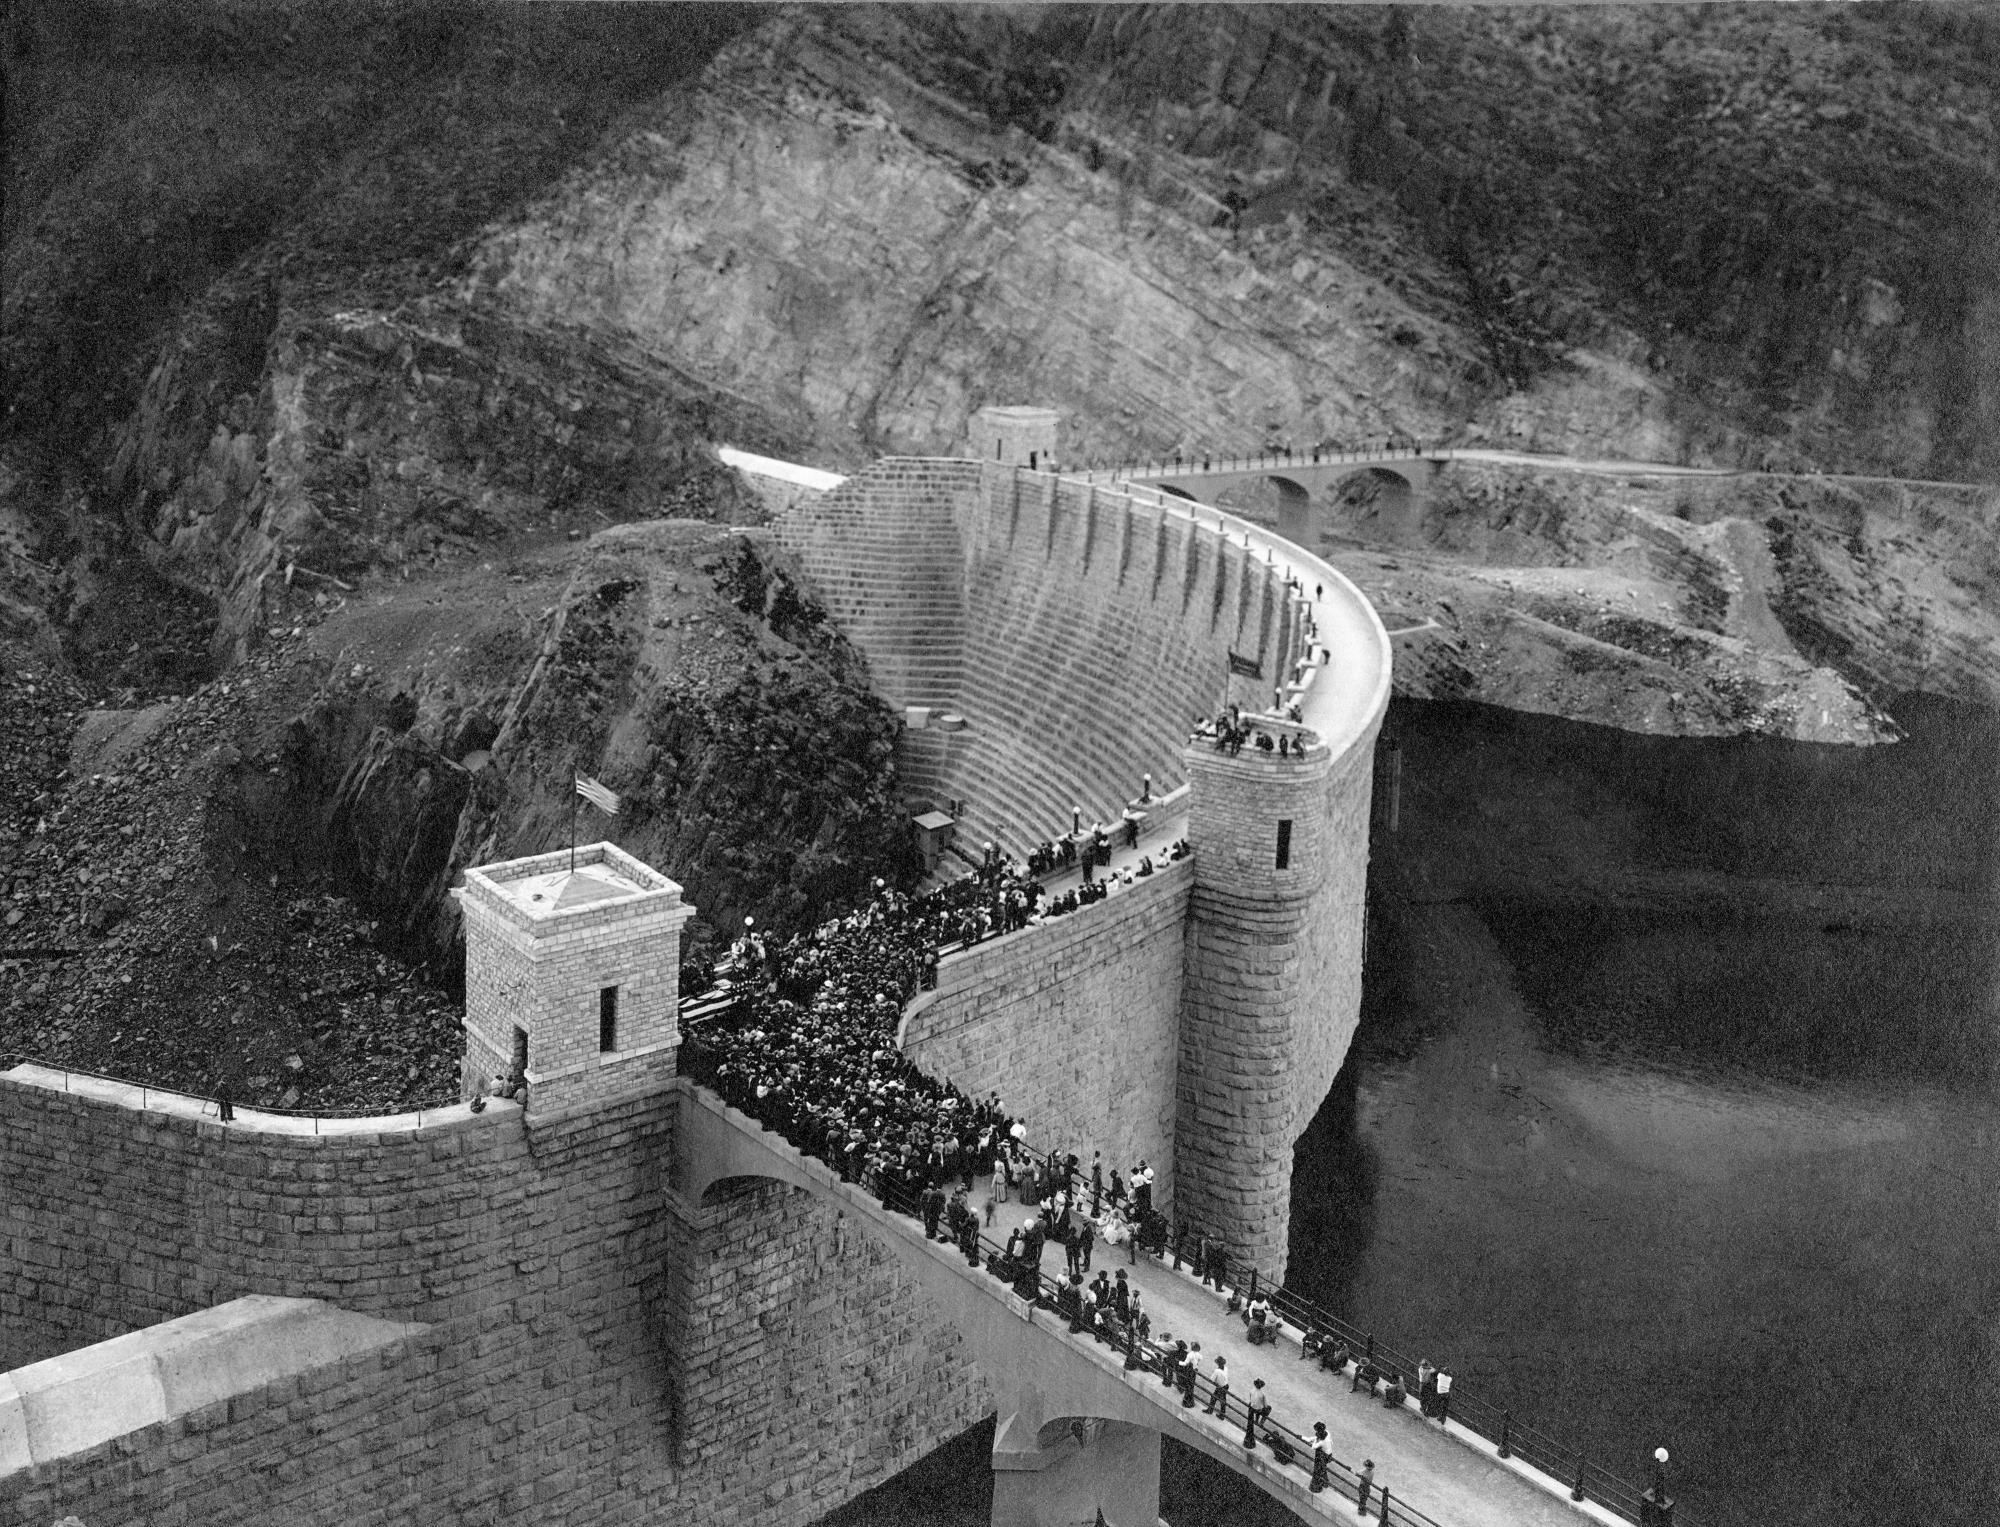 Photo 4 - Roosevelt Dam - 1987.1.1949